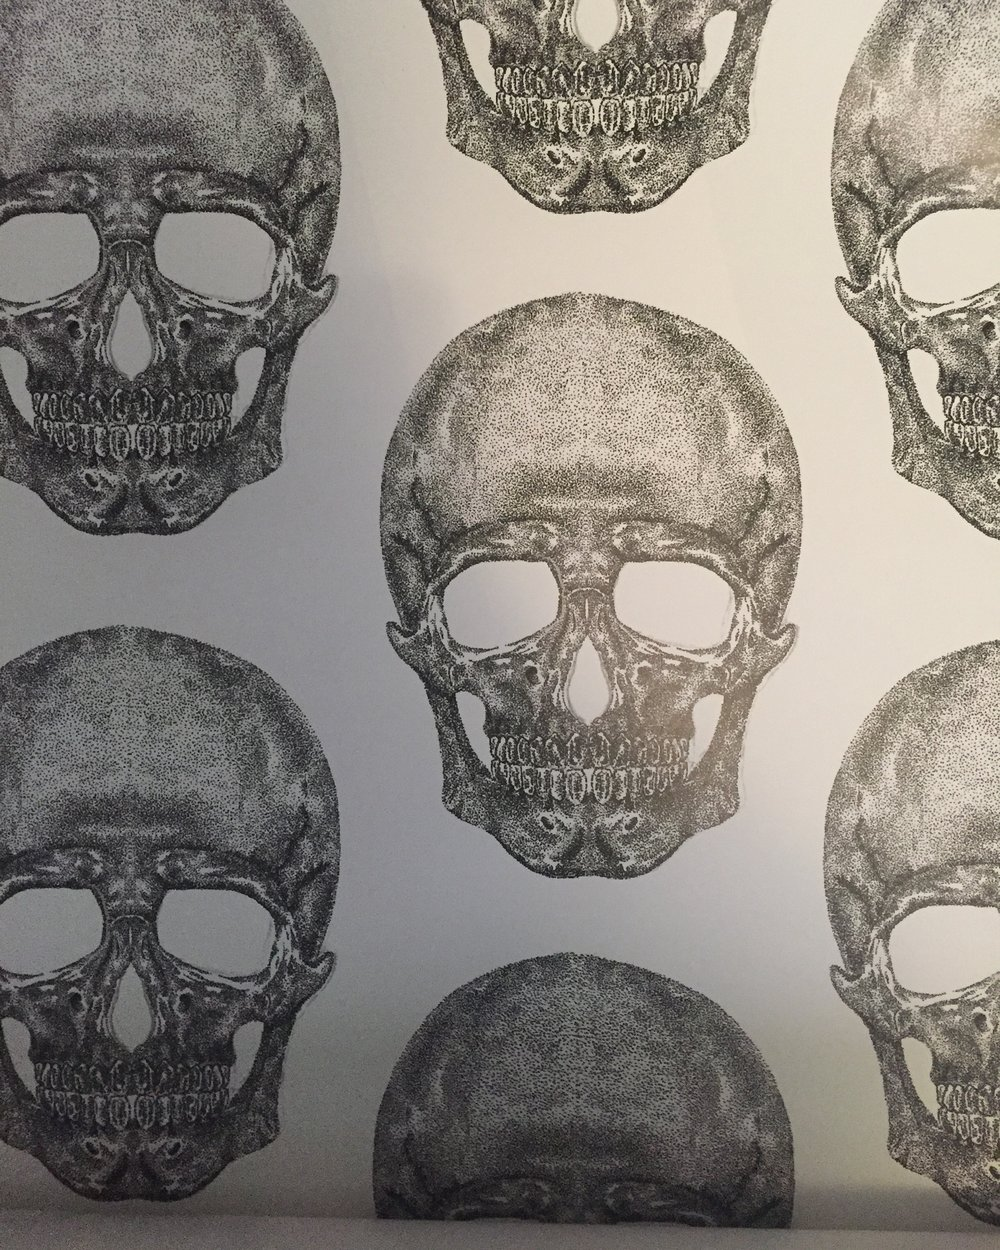 Skull_CandiceKayeDesgin_AntonyRush.JPG